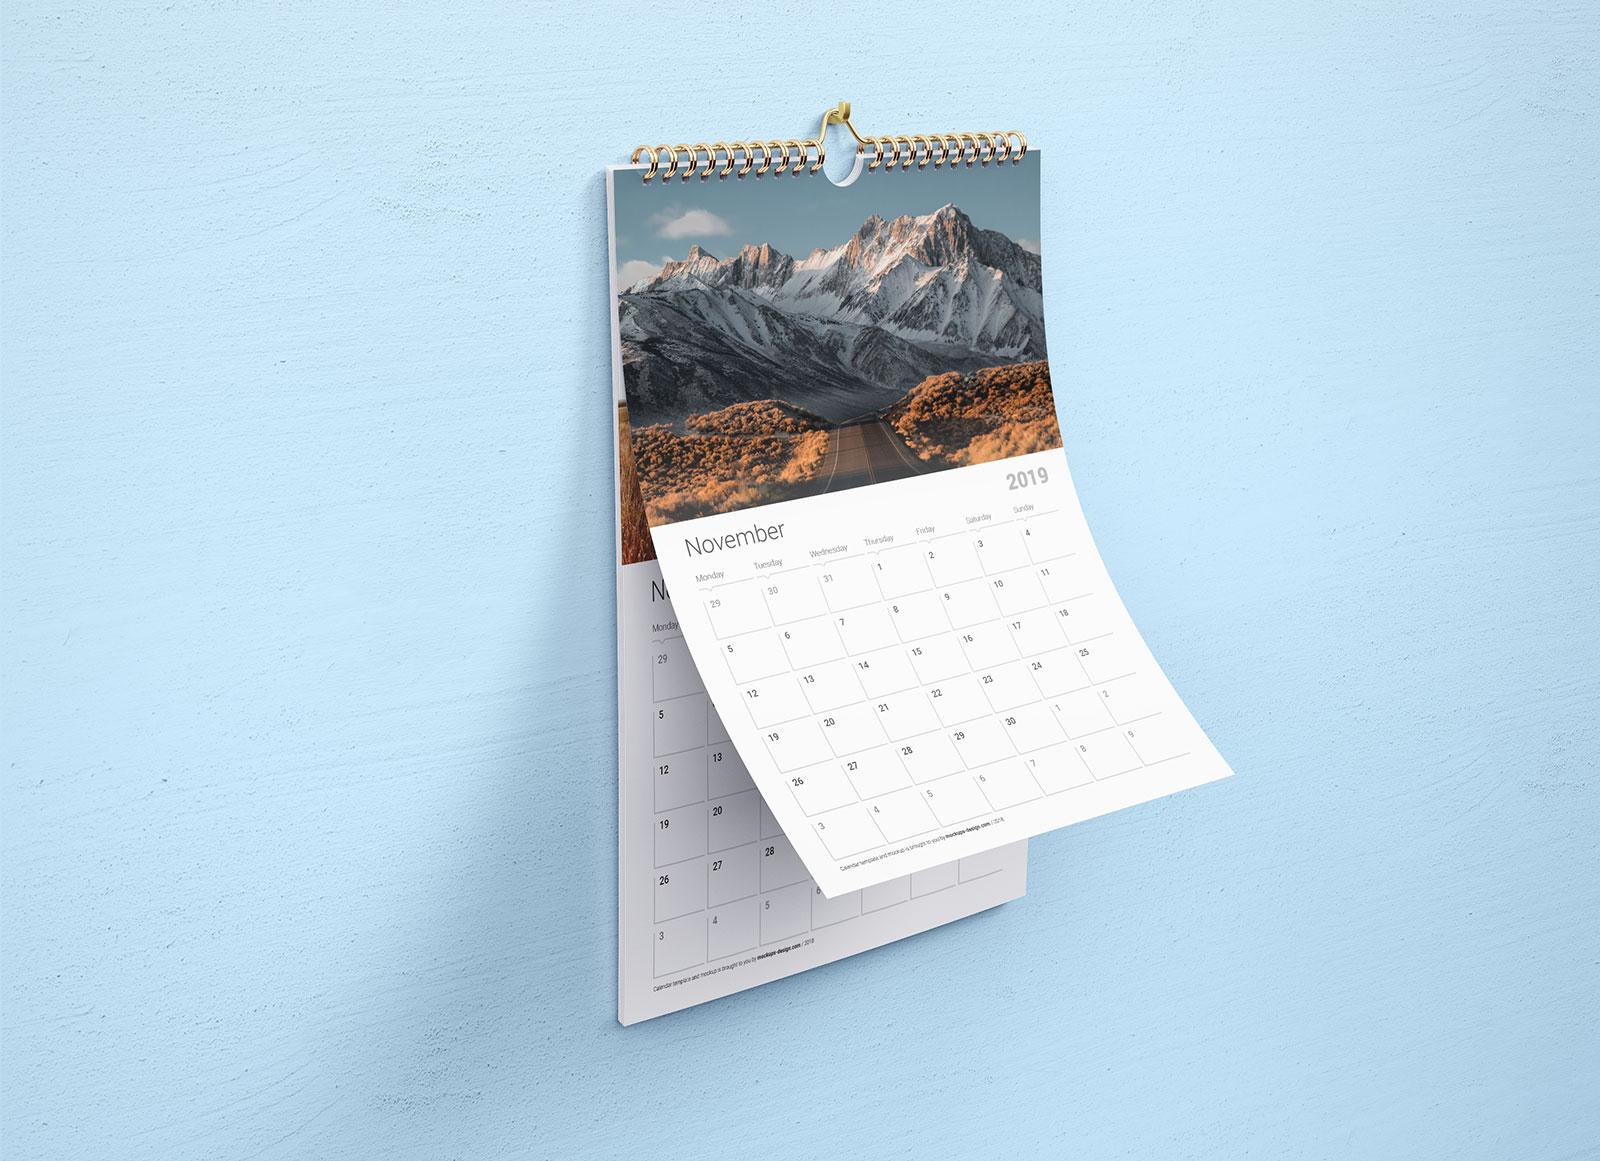 Free-Premium-Wall-Calendar-Mockup-PSD-&-Template-Set-2019